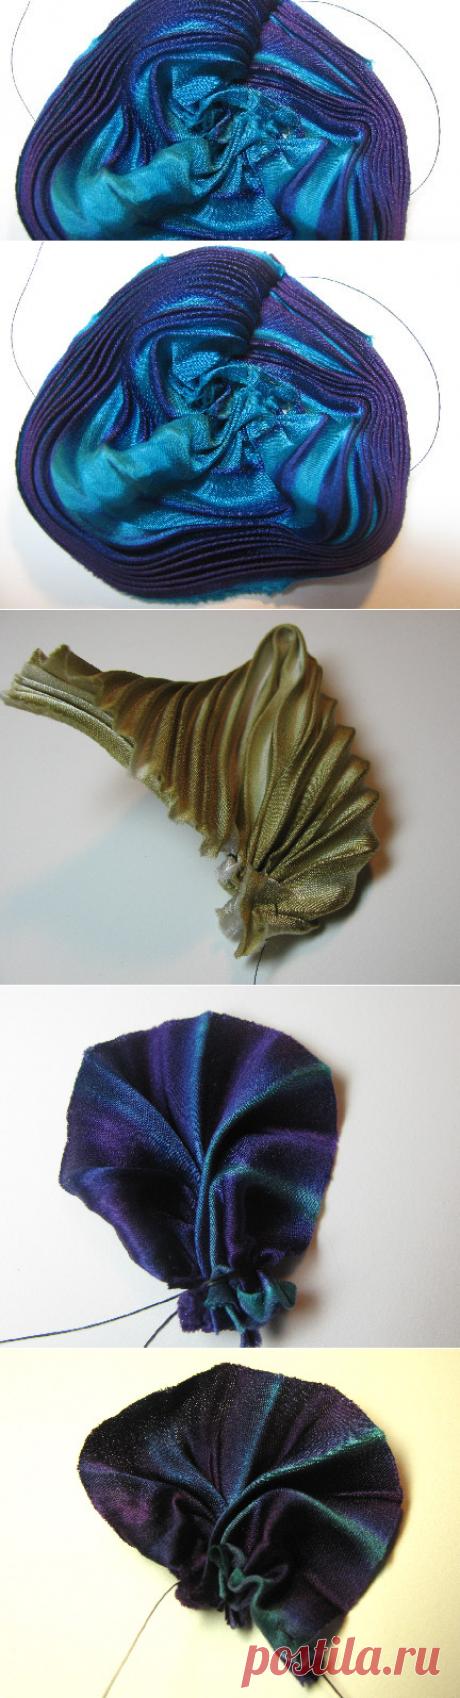 Beading Arts: Making pleated silk shibori ribbon flowers - part one